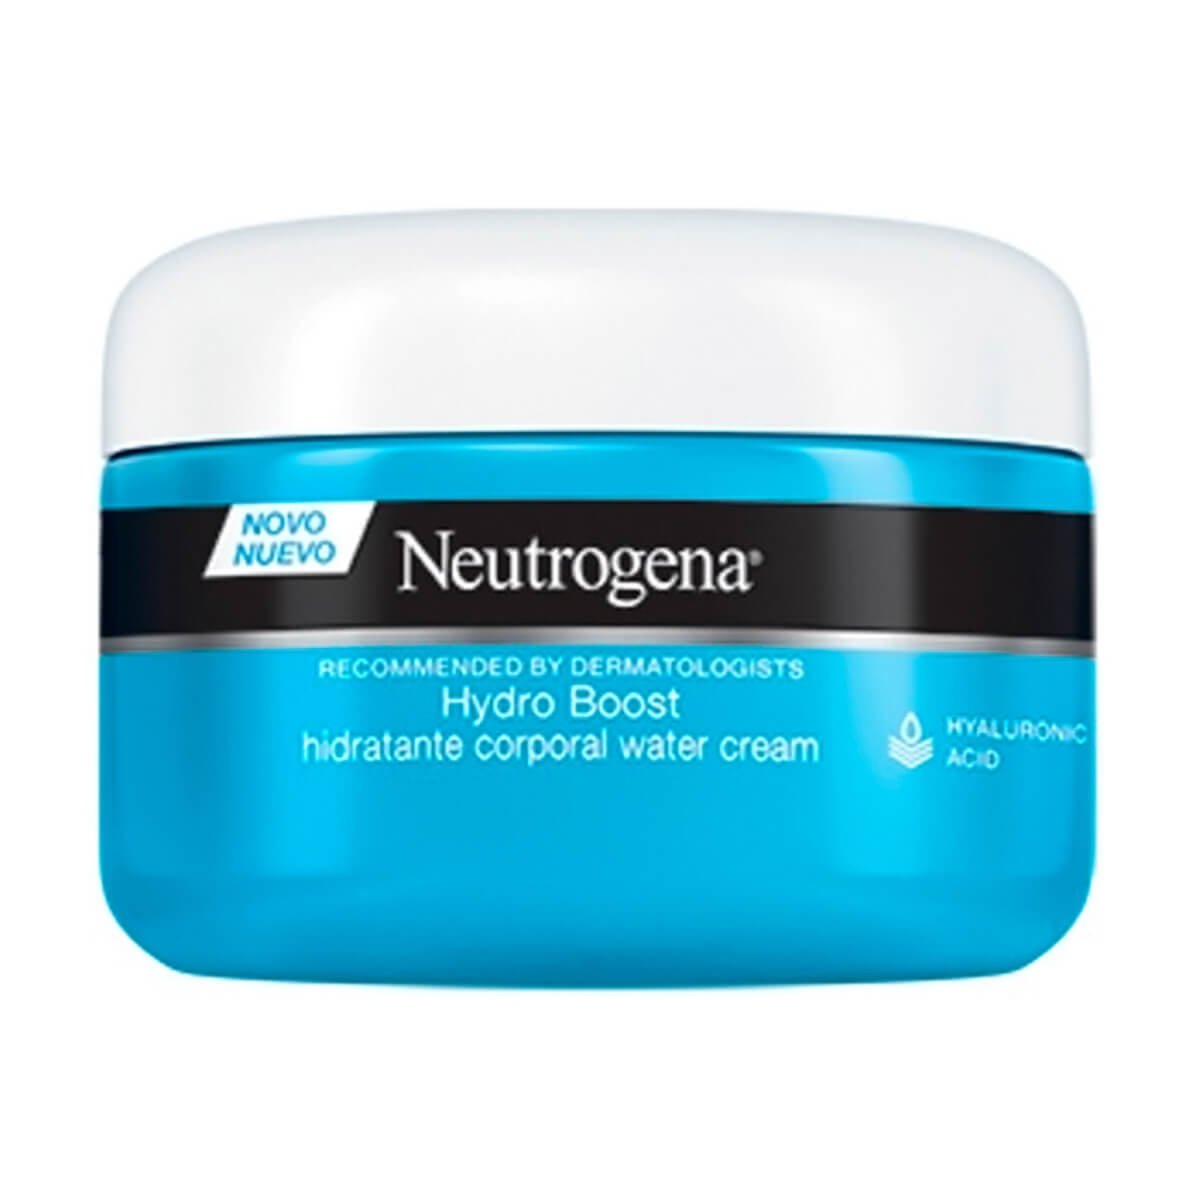 Hidratante Corporal Neutrogena Hydro Boost com 200ml 200ml